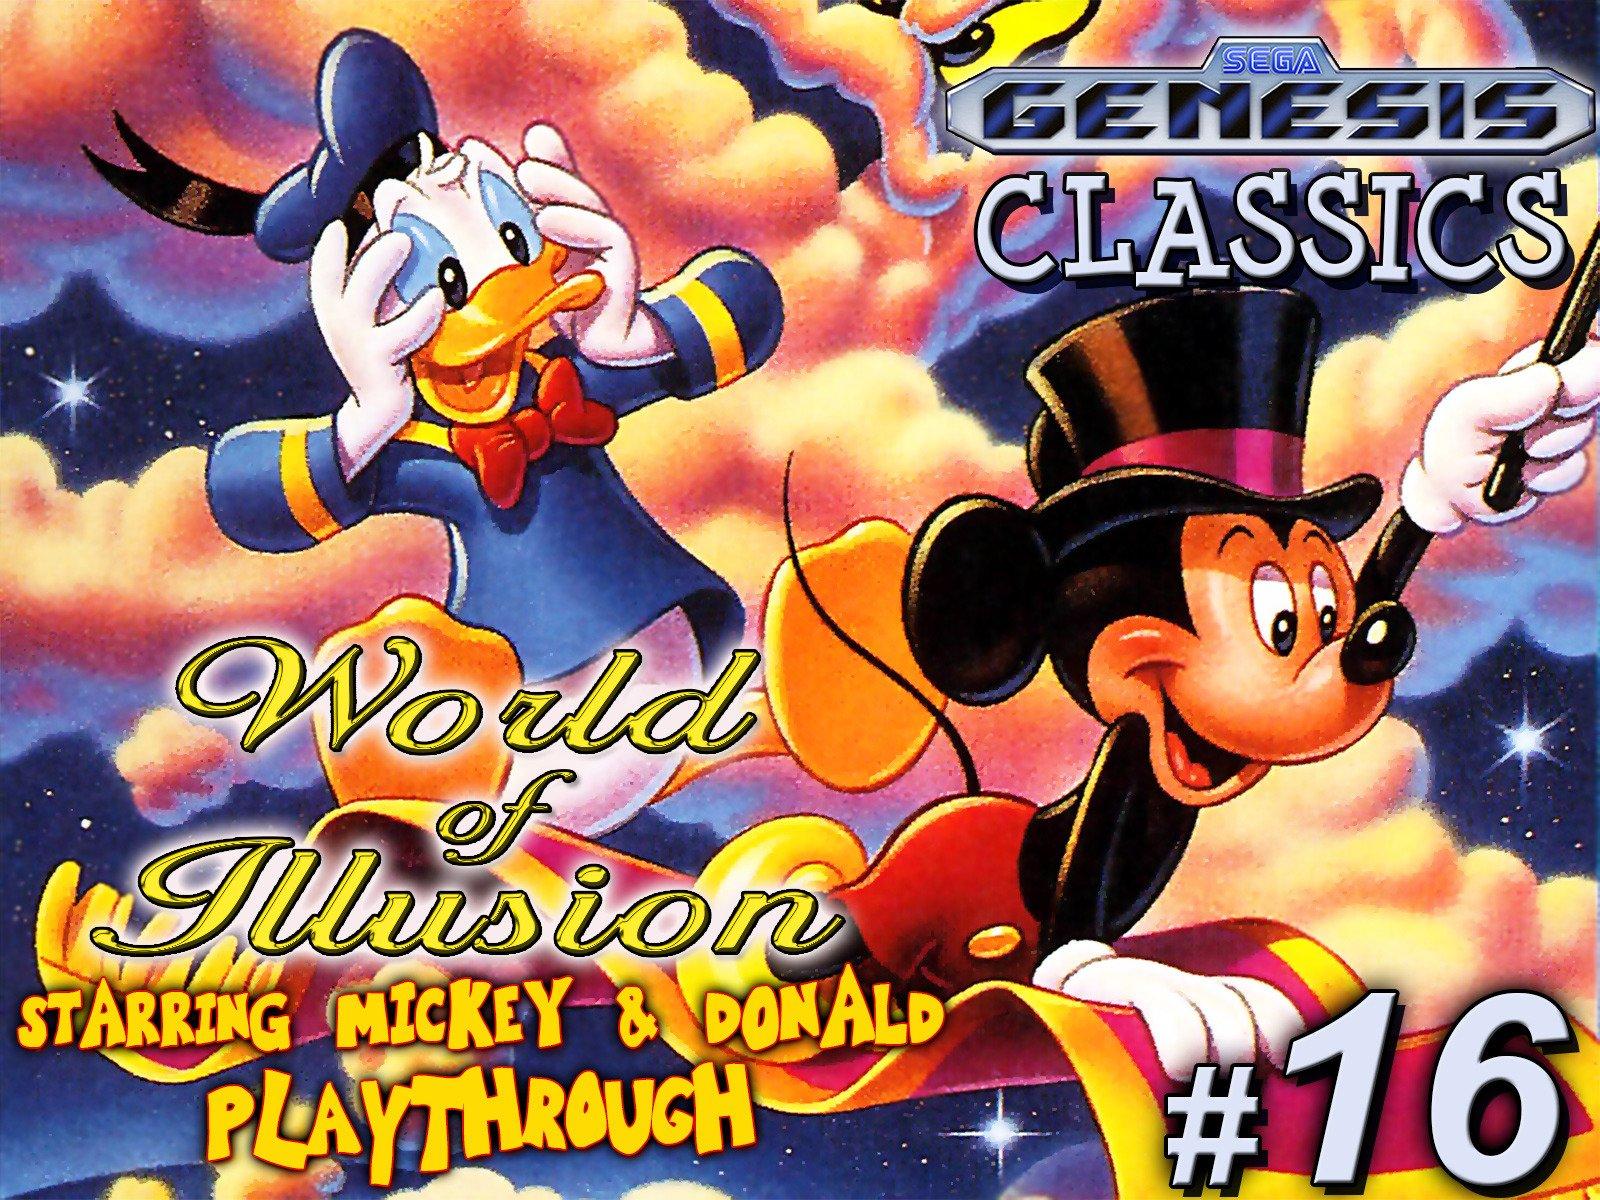 Clip: World of Illusion Starring Mickey & Donald Playthrough (Genesis Classics 16) - Season 1